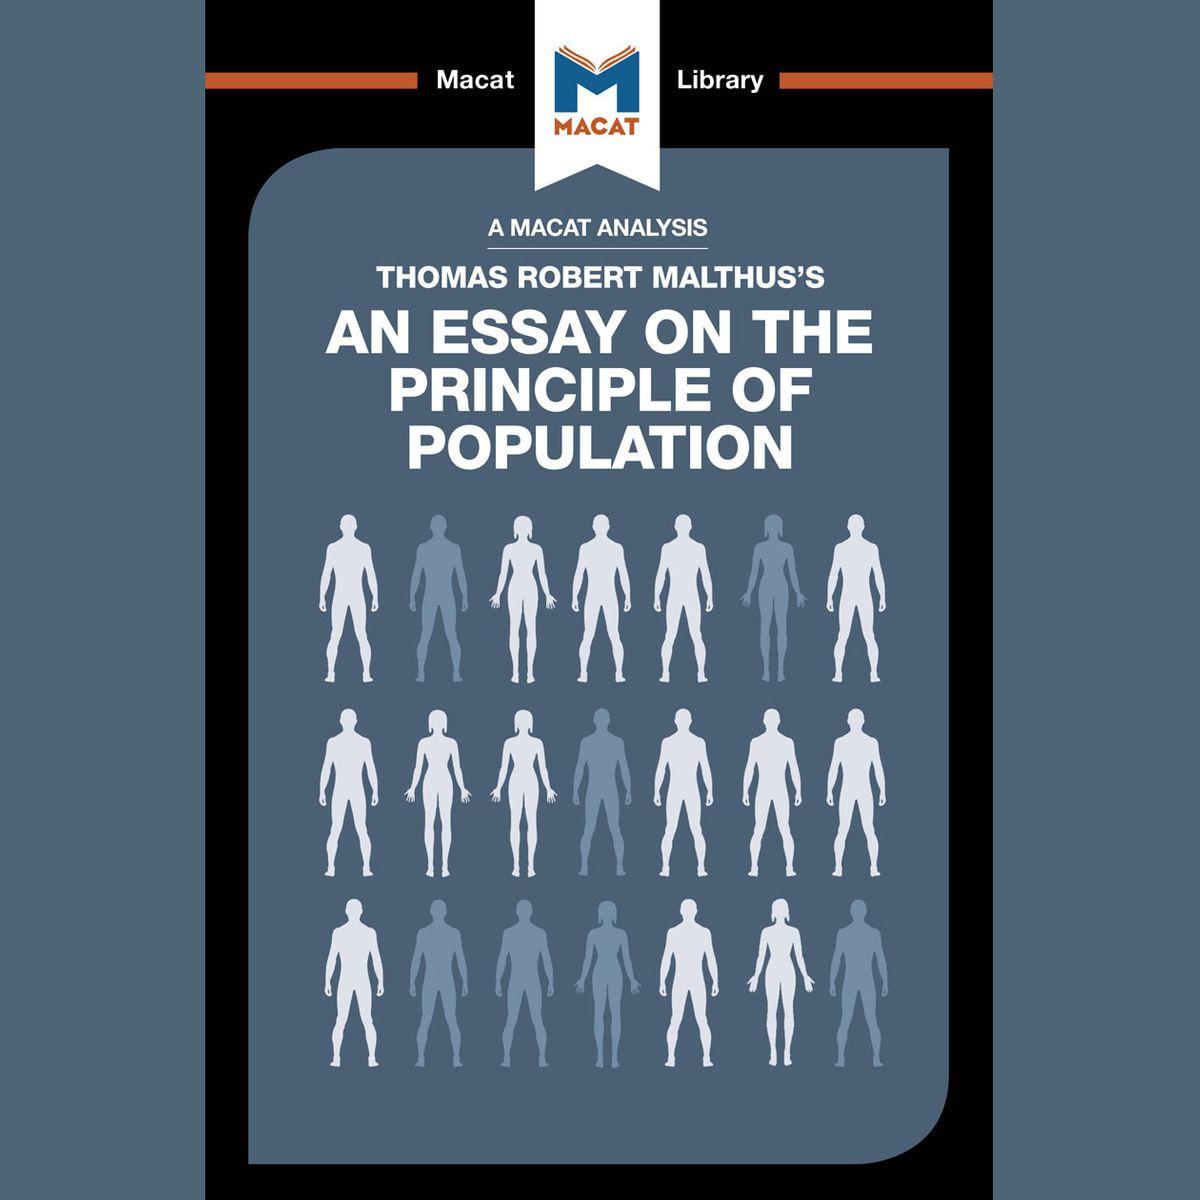 019 Thomas Robert Malthus An Essay On The Principle Of Population Stupendous After Reading Malthus's Principles Darwin Got Idea That Ap Euro Full